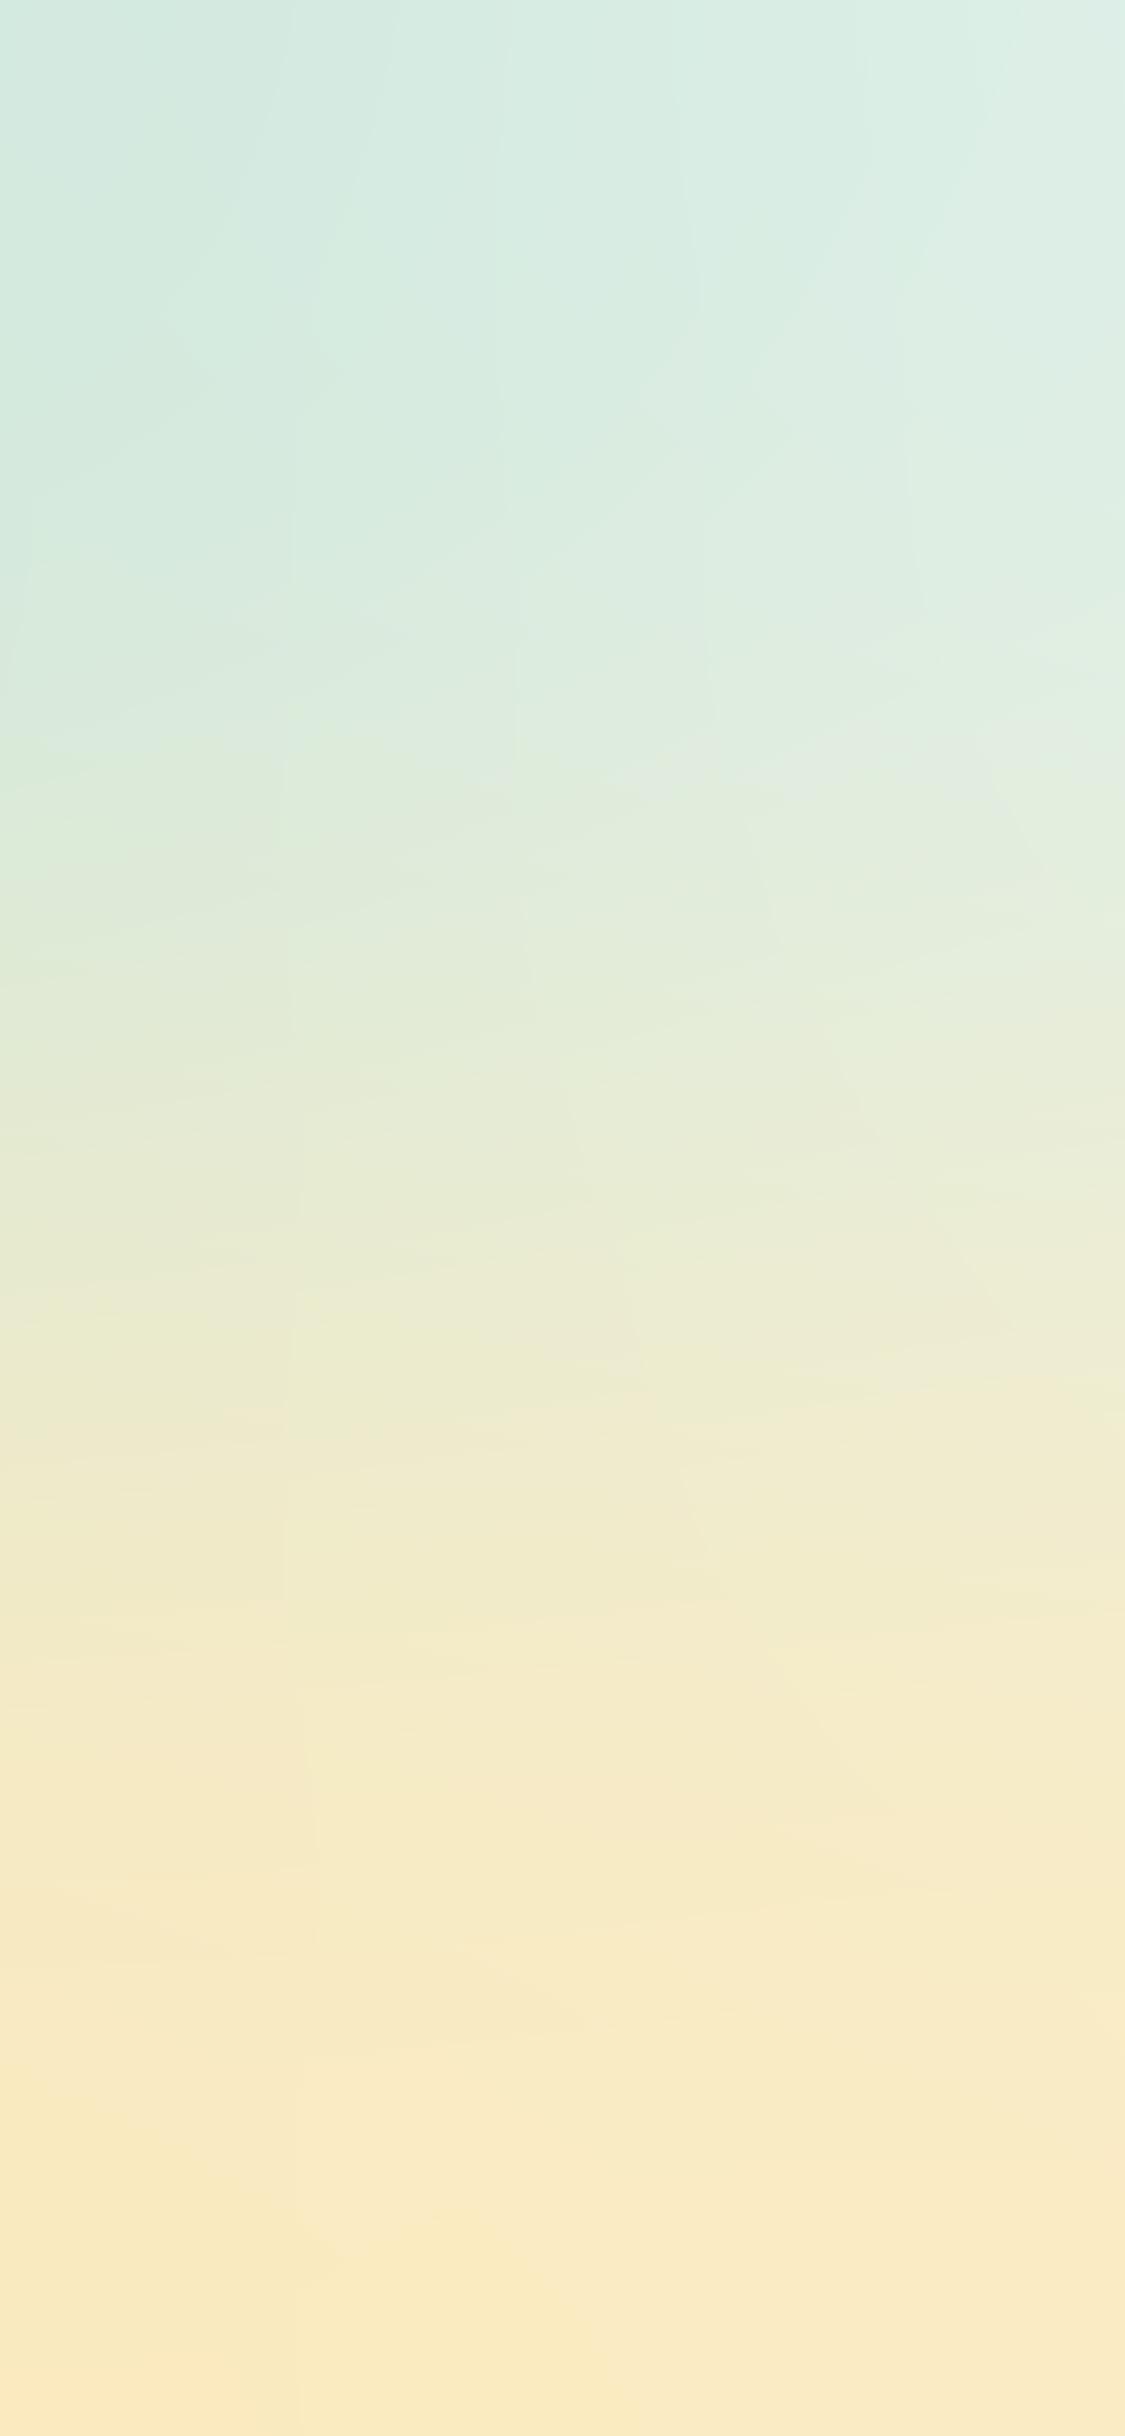 iPhonexpapers.com-Apple-iPhone-wallpaper-sn88-light-soft-pastel-blur-gradation